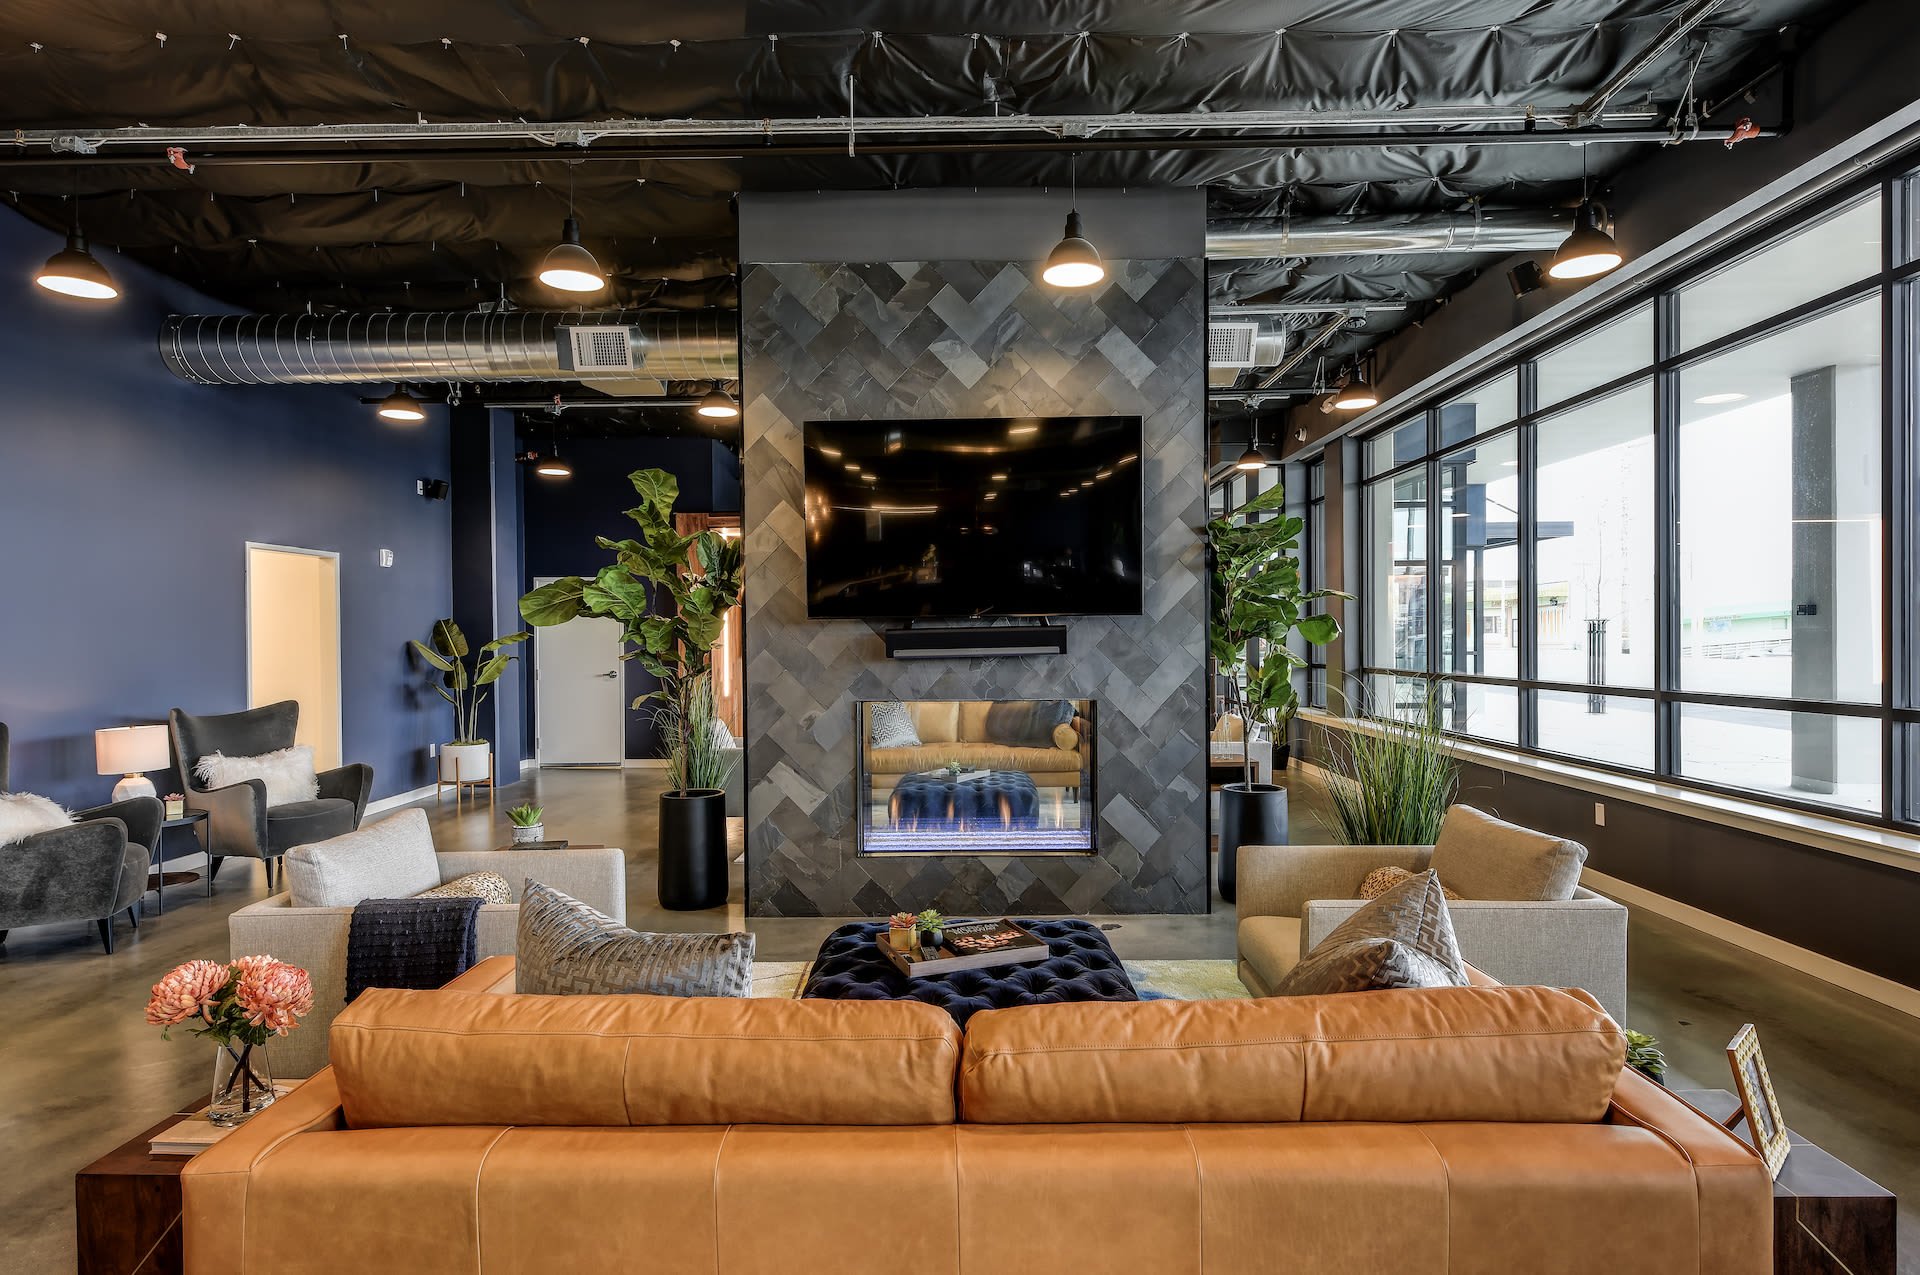 Luxury apartments at Kinect @ Broadway in Everett, Washington